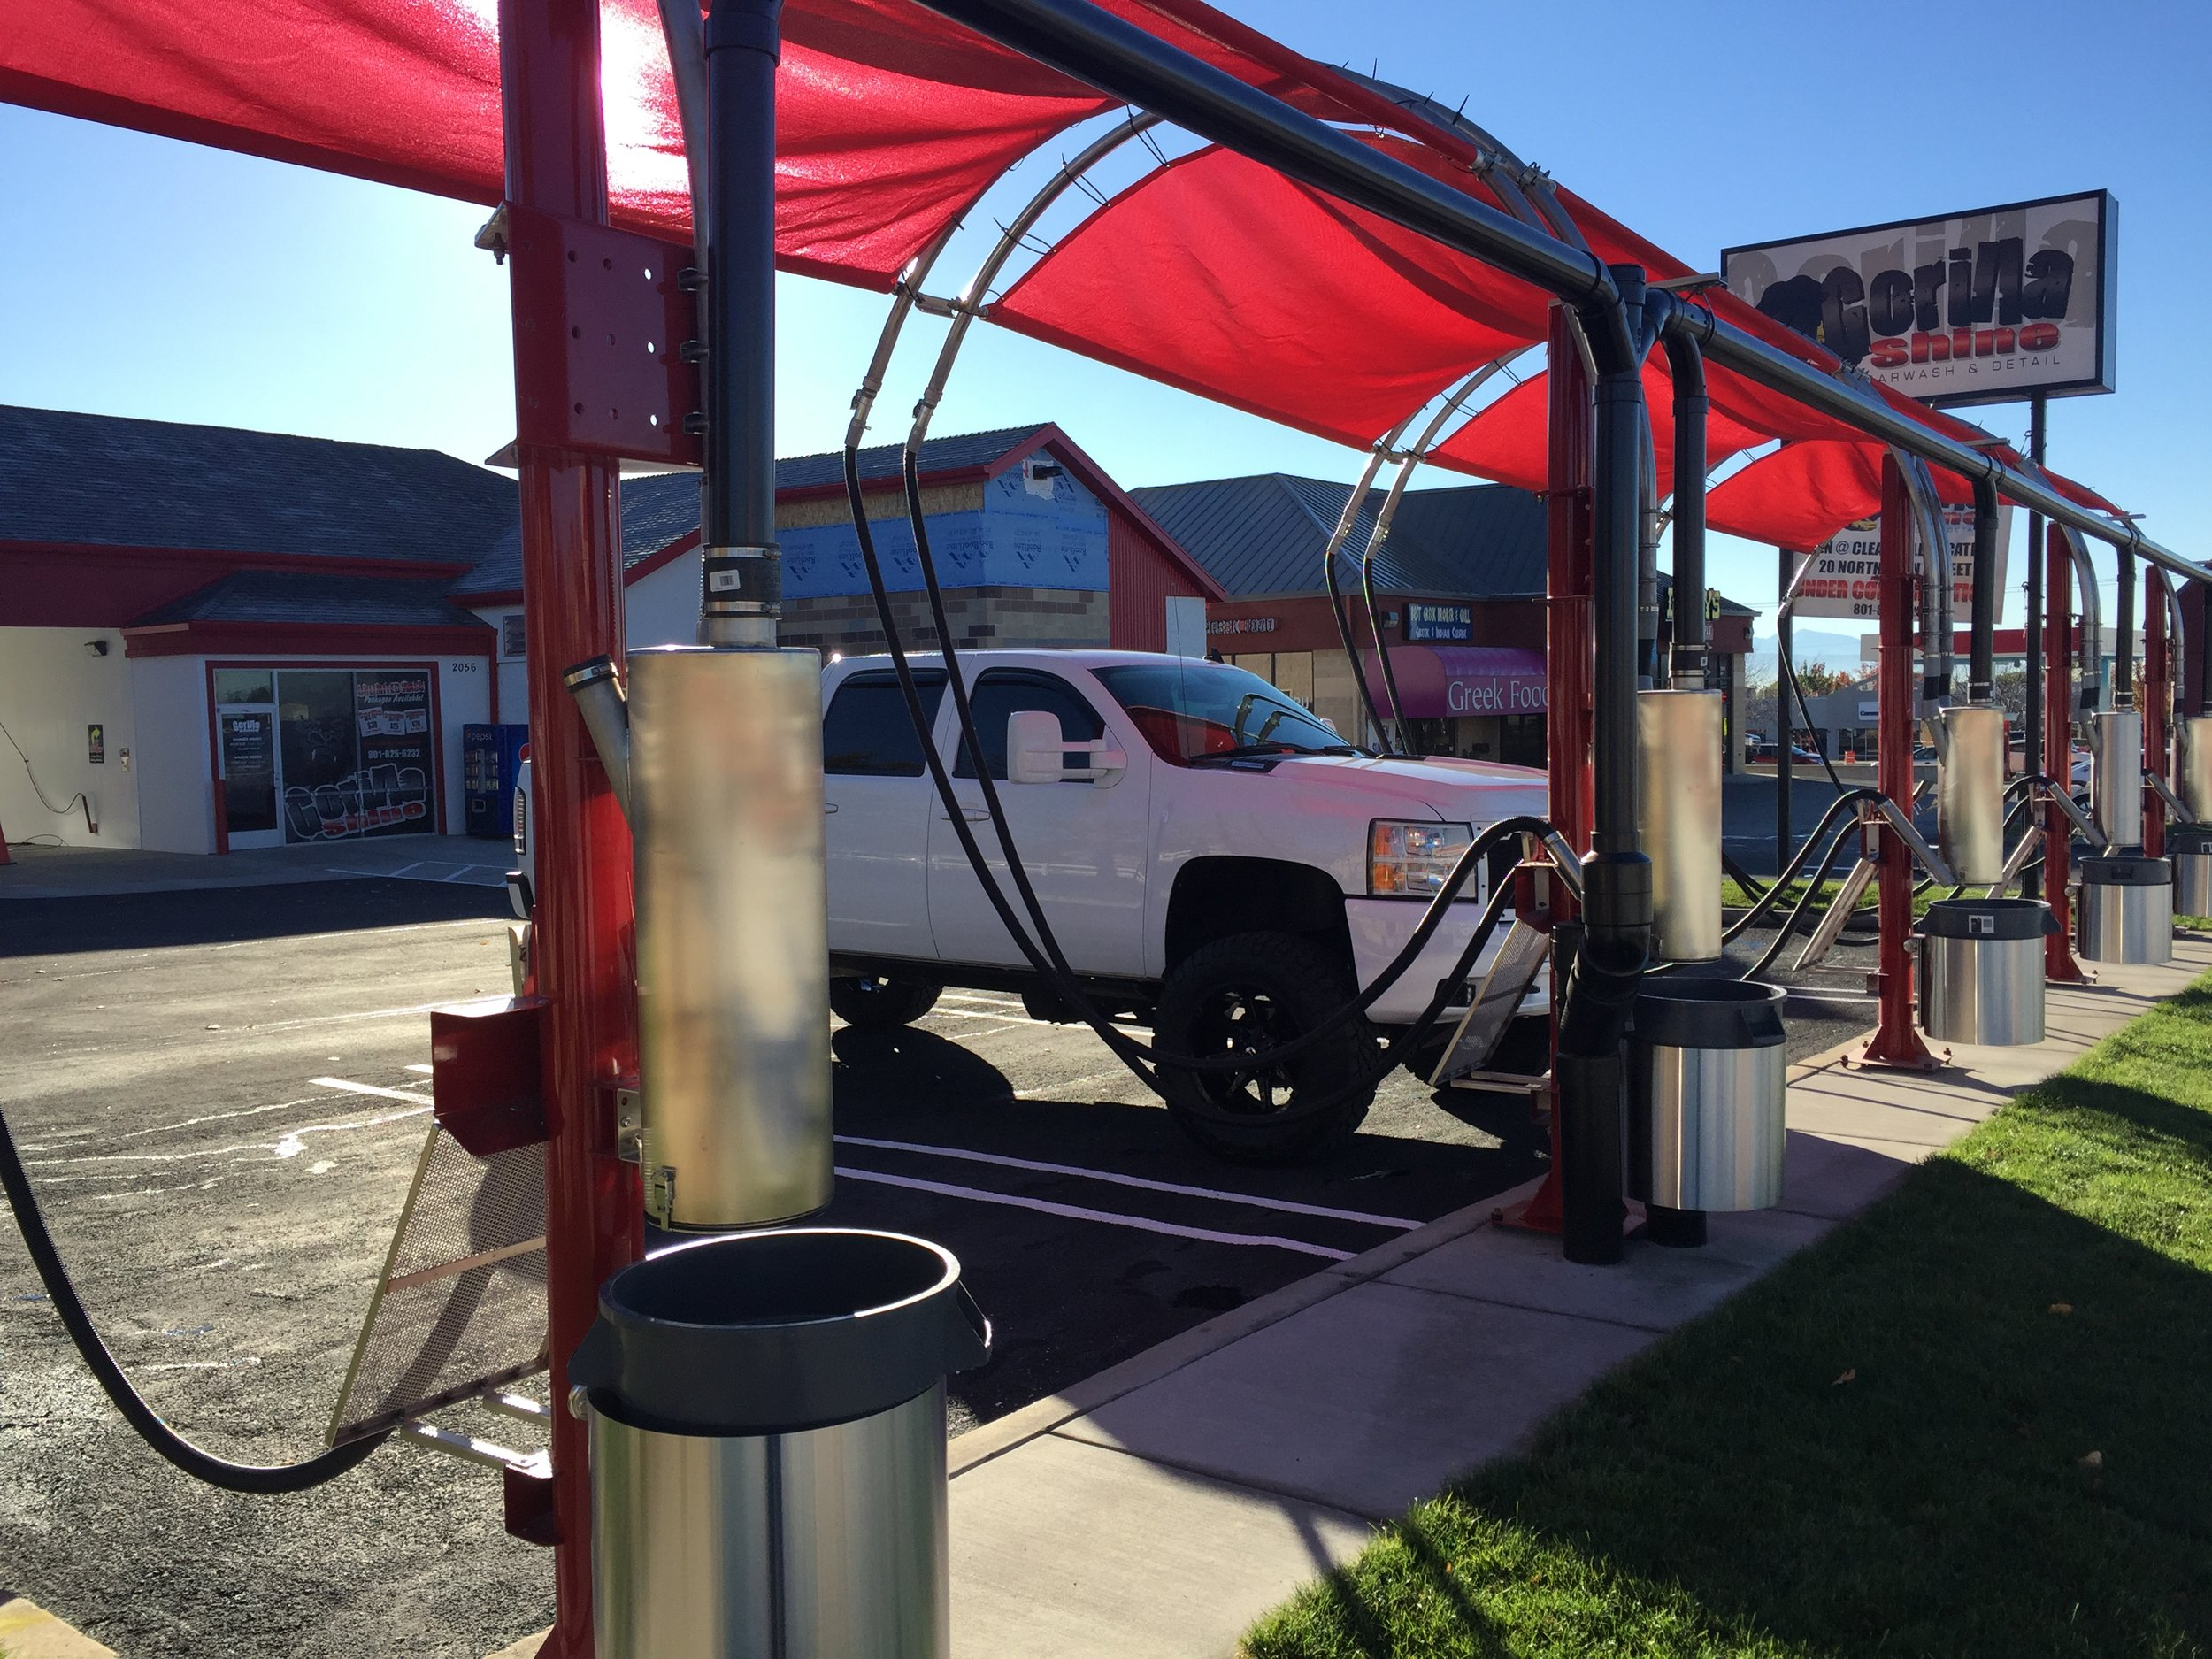 Gorilla Shine Auto Detailing Automatic Car Wash In Layton Ut